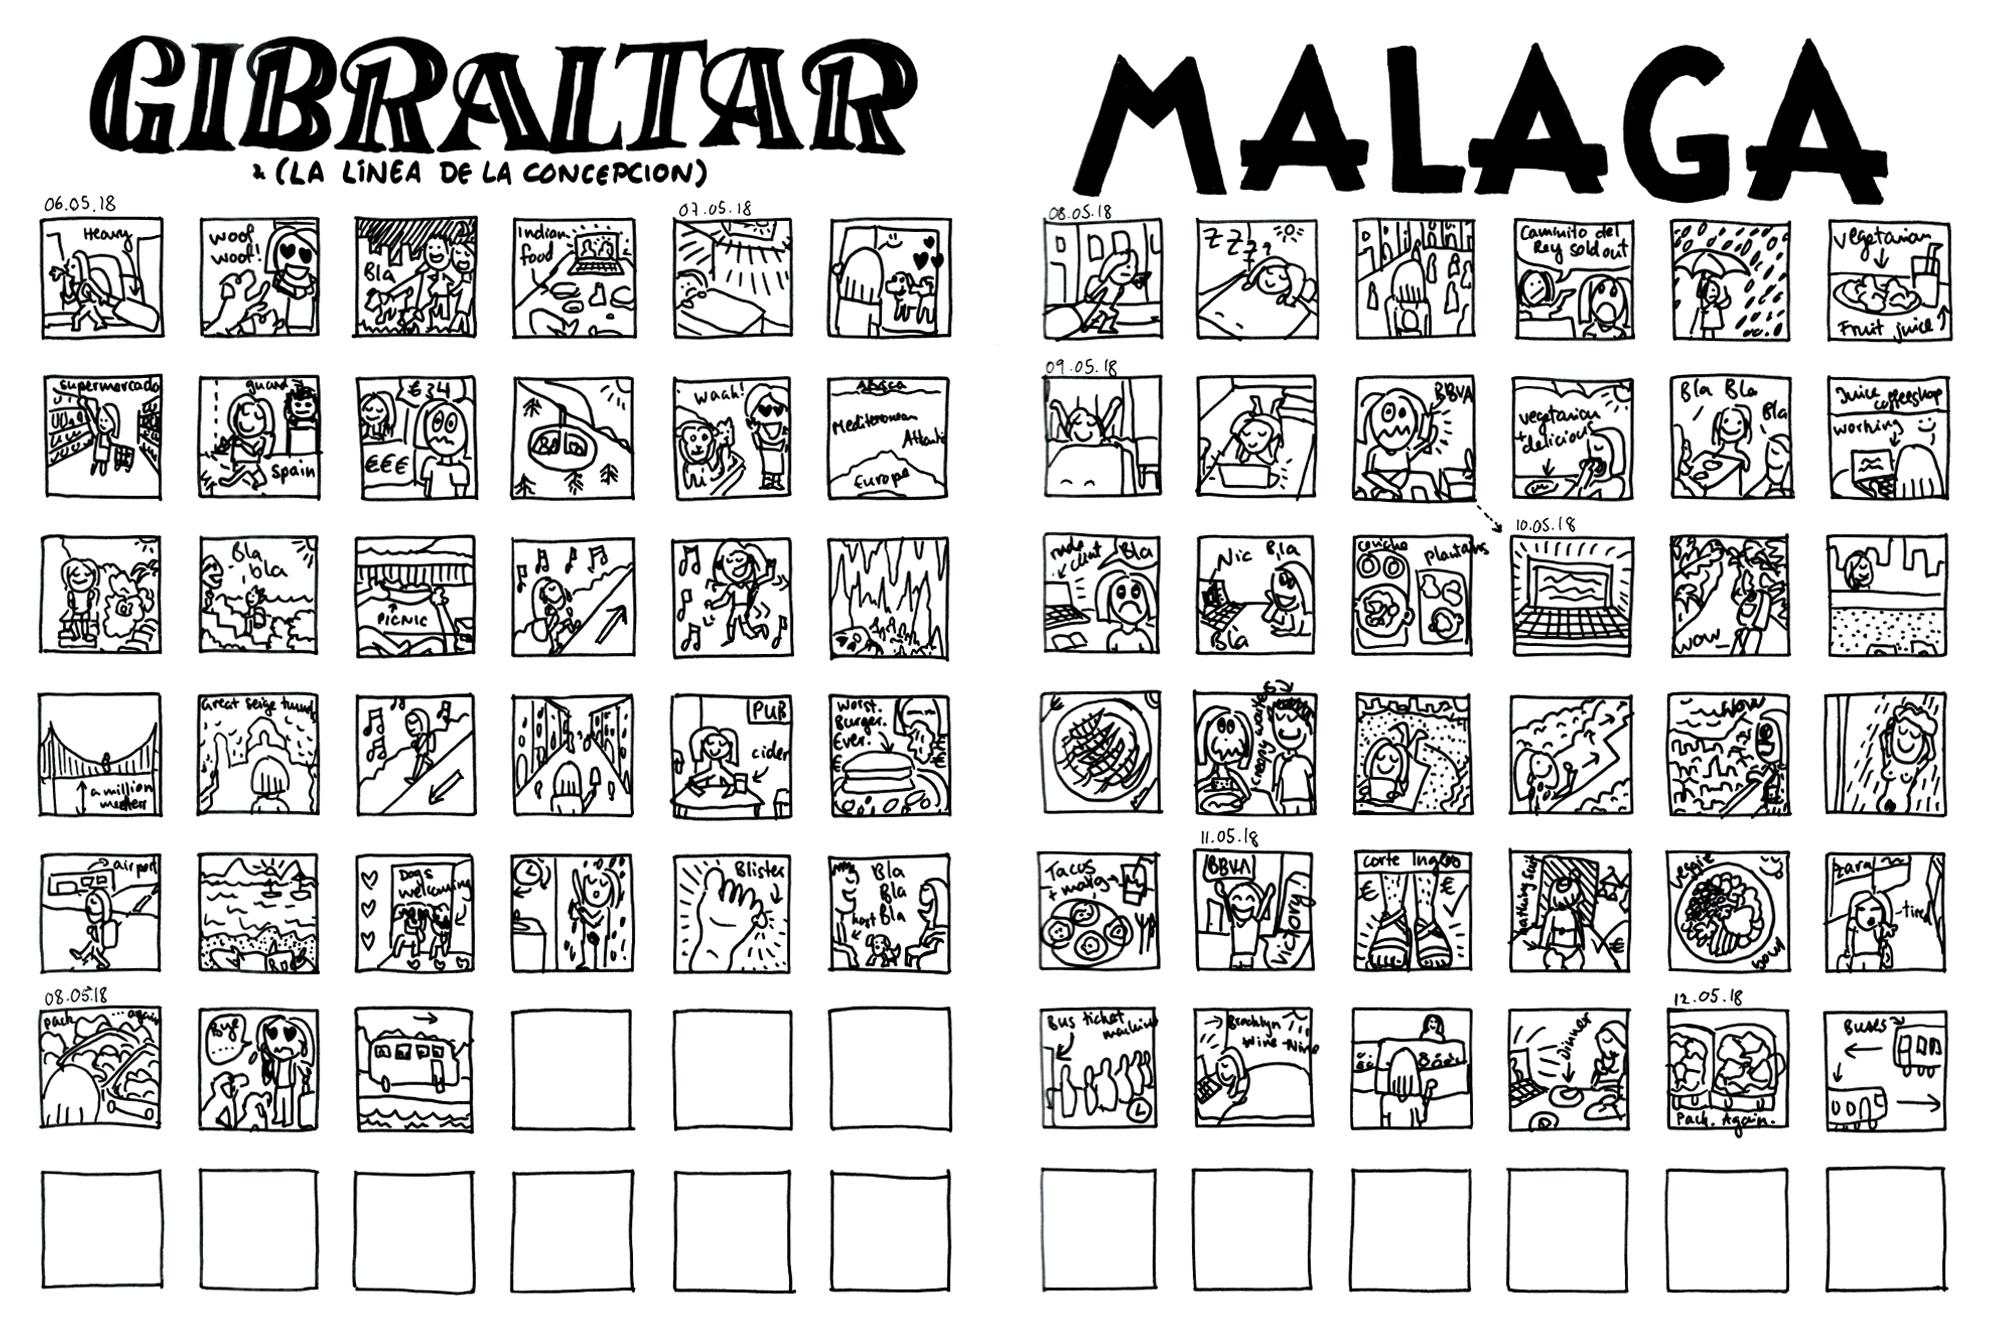 21_gibraltar_malaga_comic_web.jpg